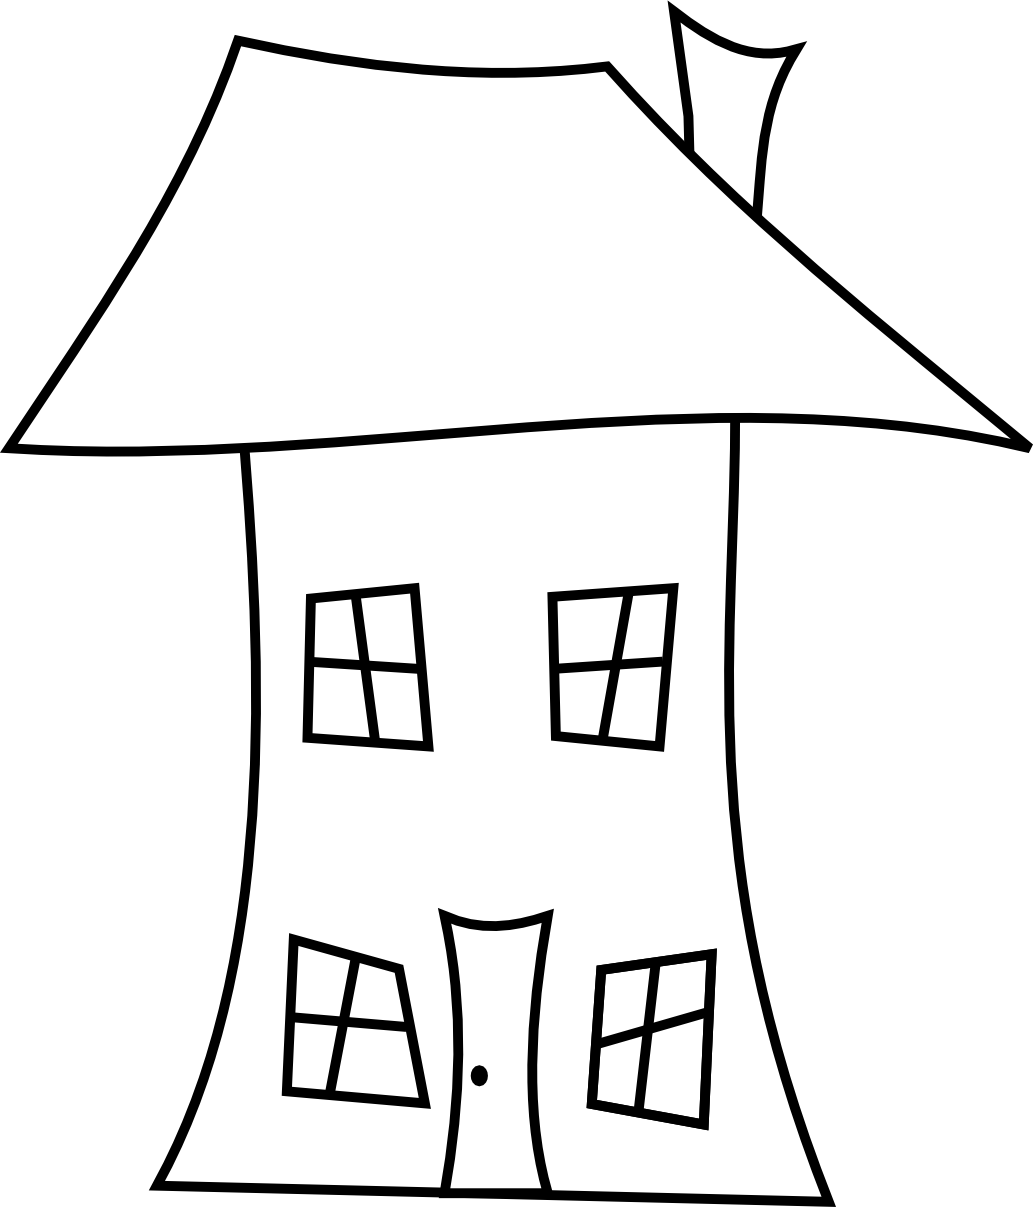 House Line Art.